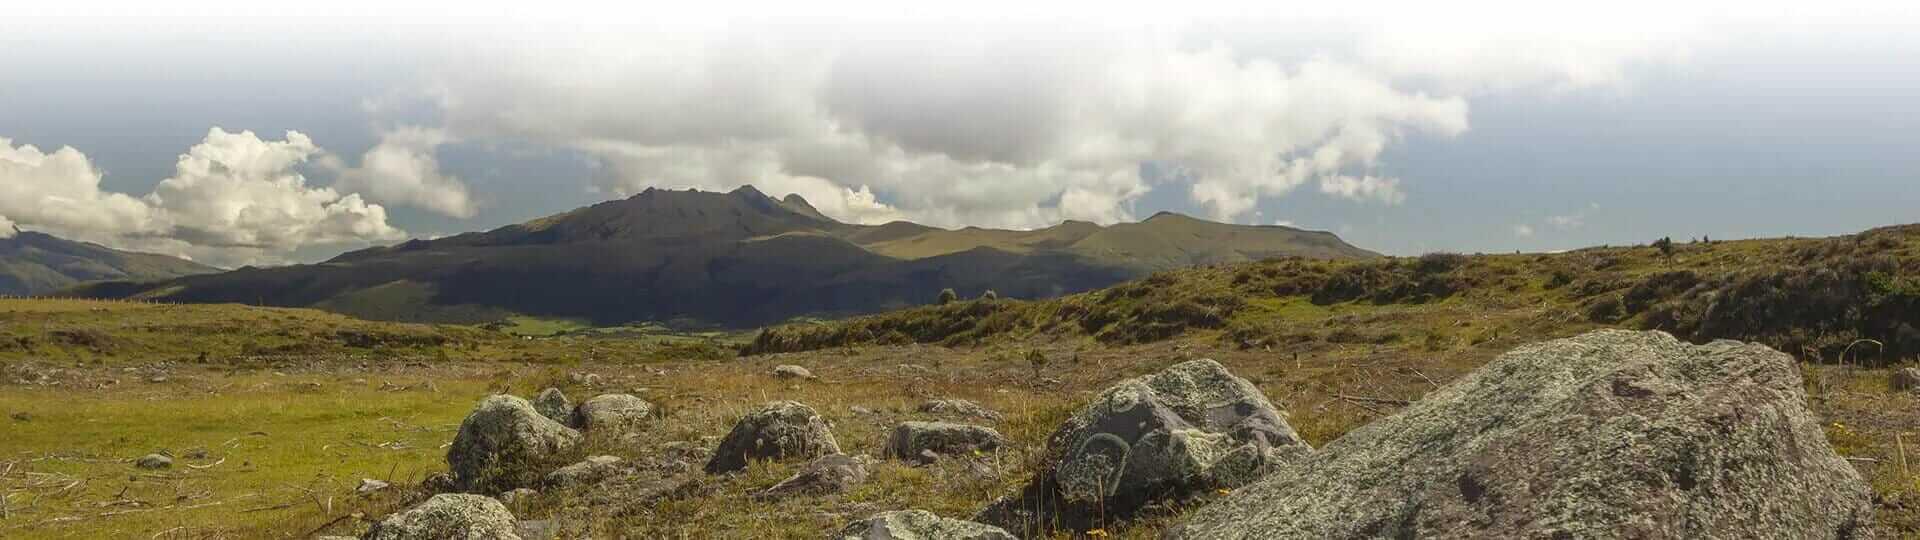 pasochoa reserve landscape in ecuador